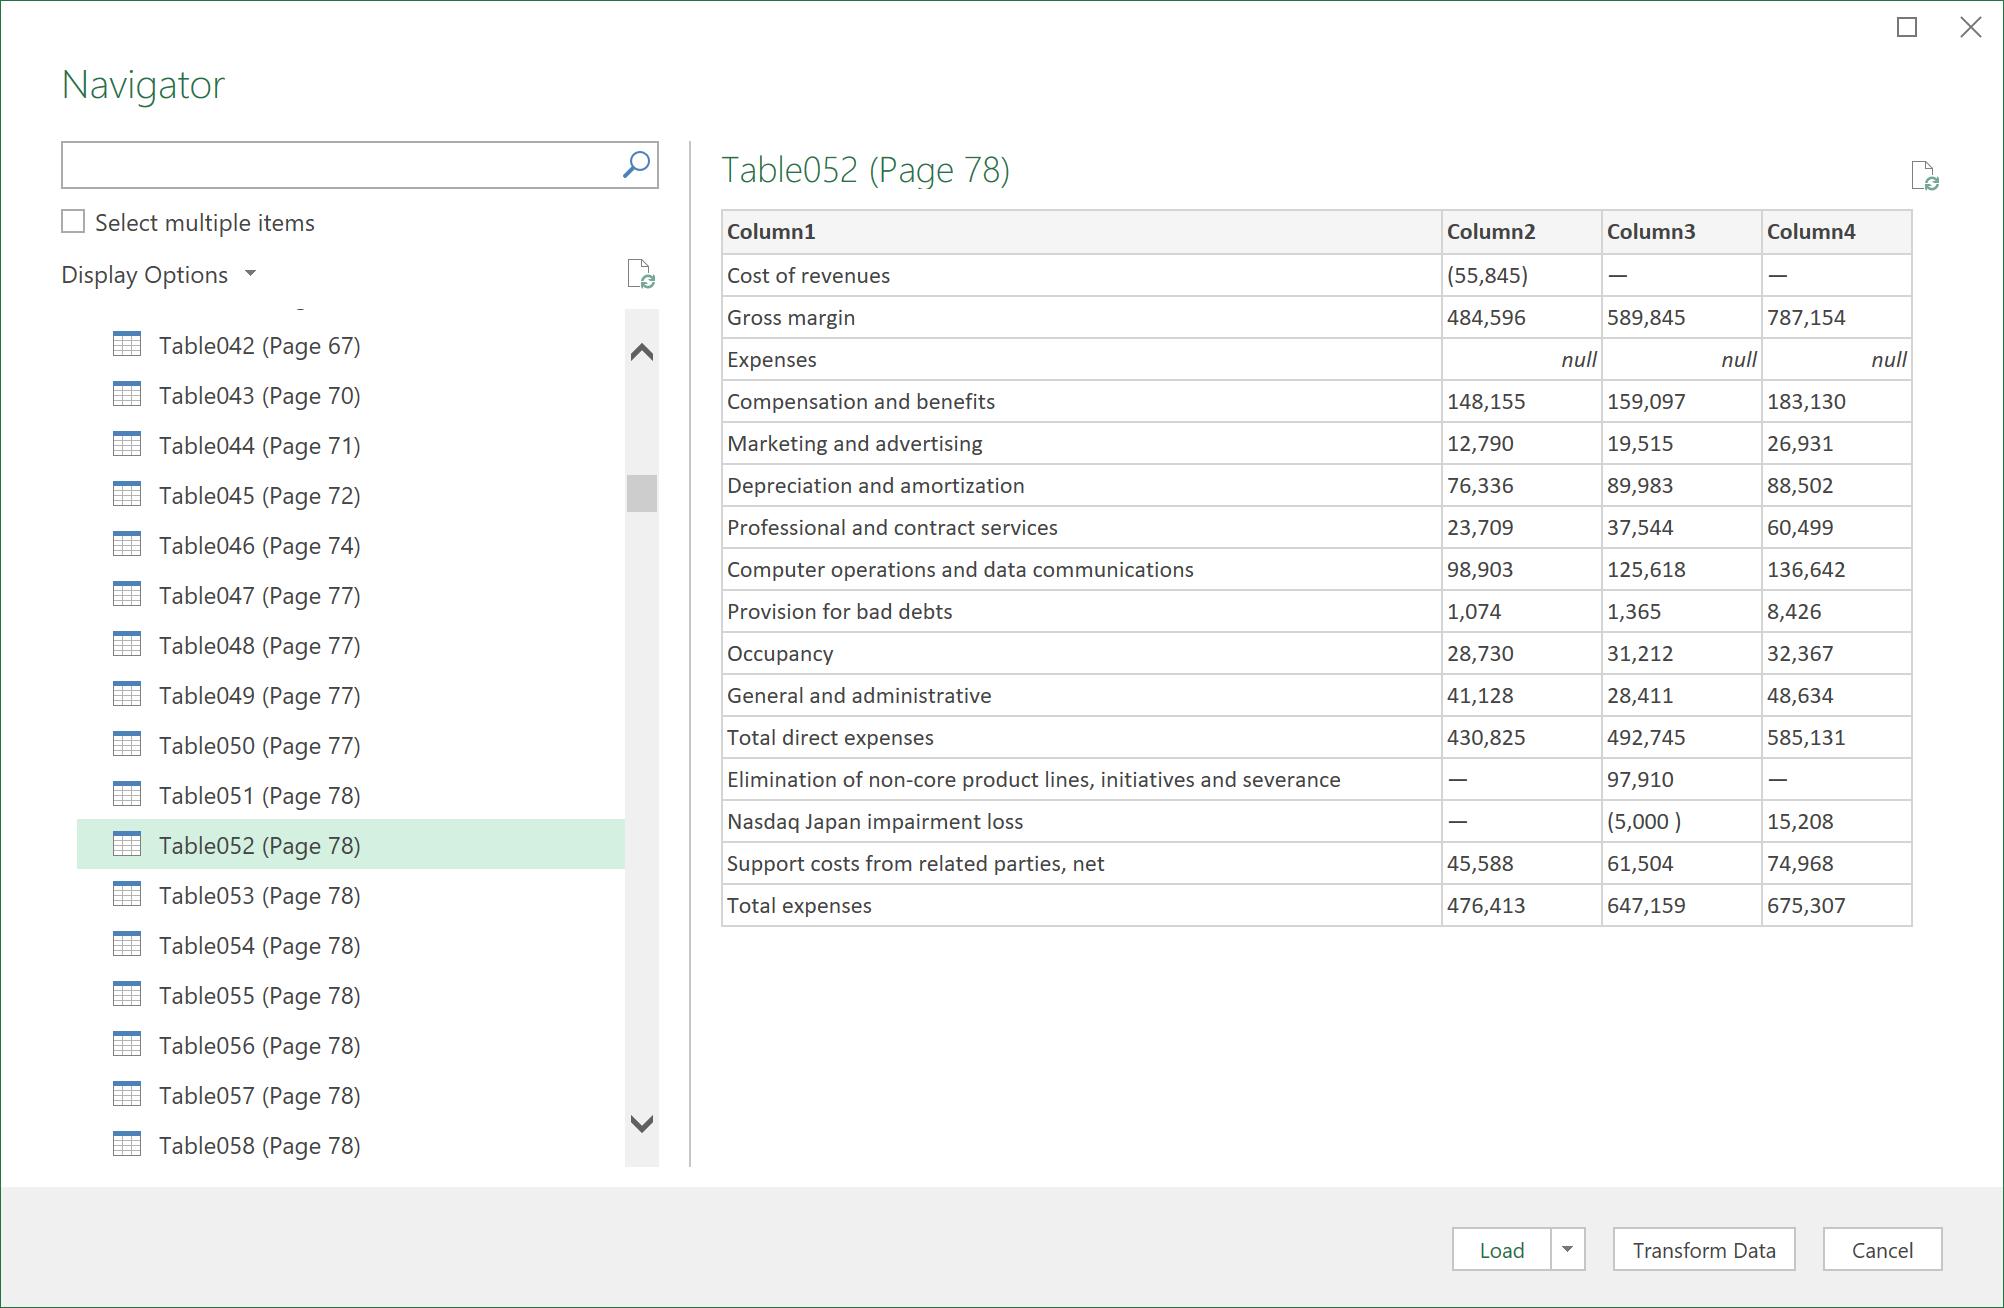 A caixa de diálogo navegador para importar dados PDF